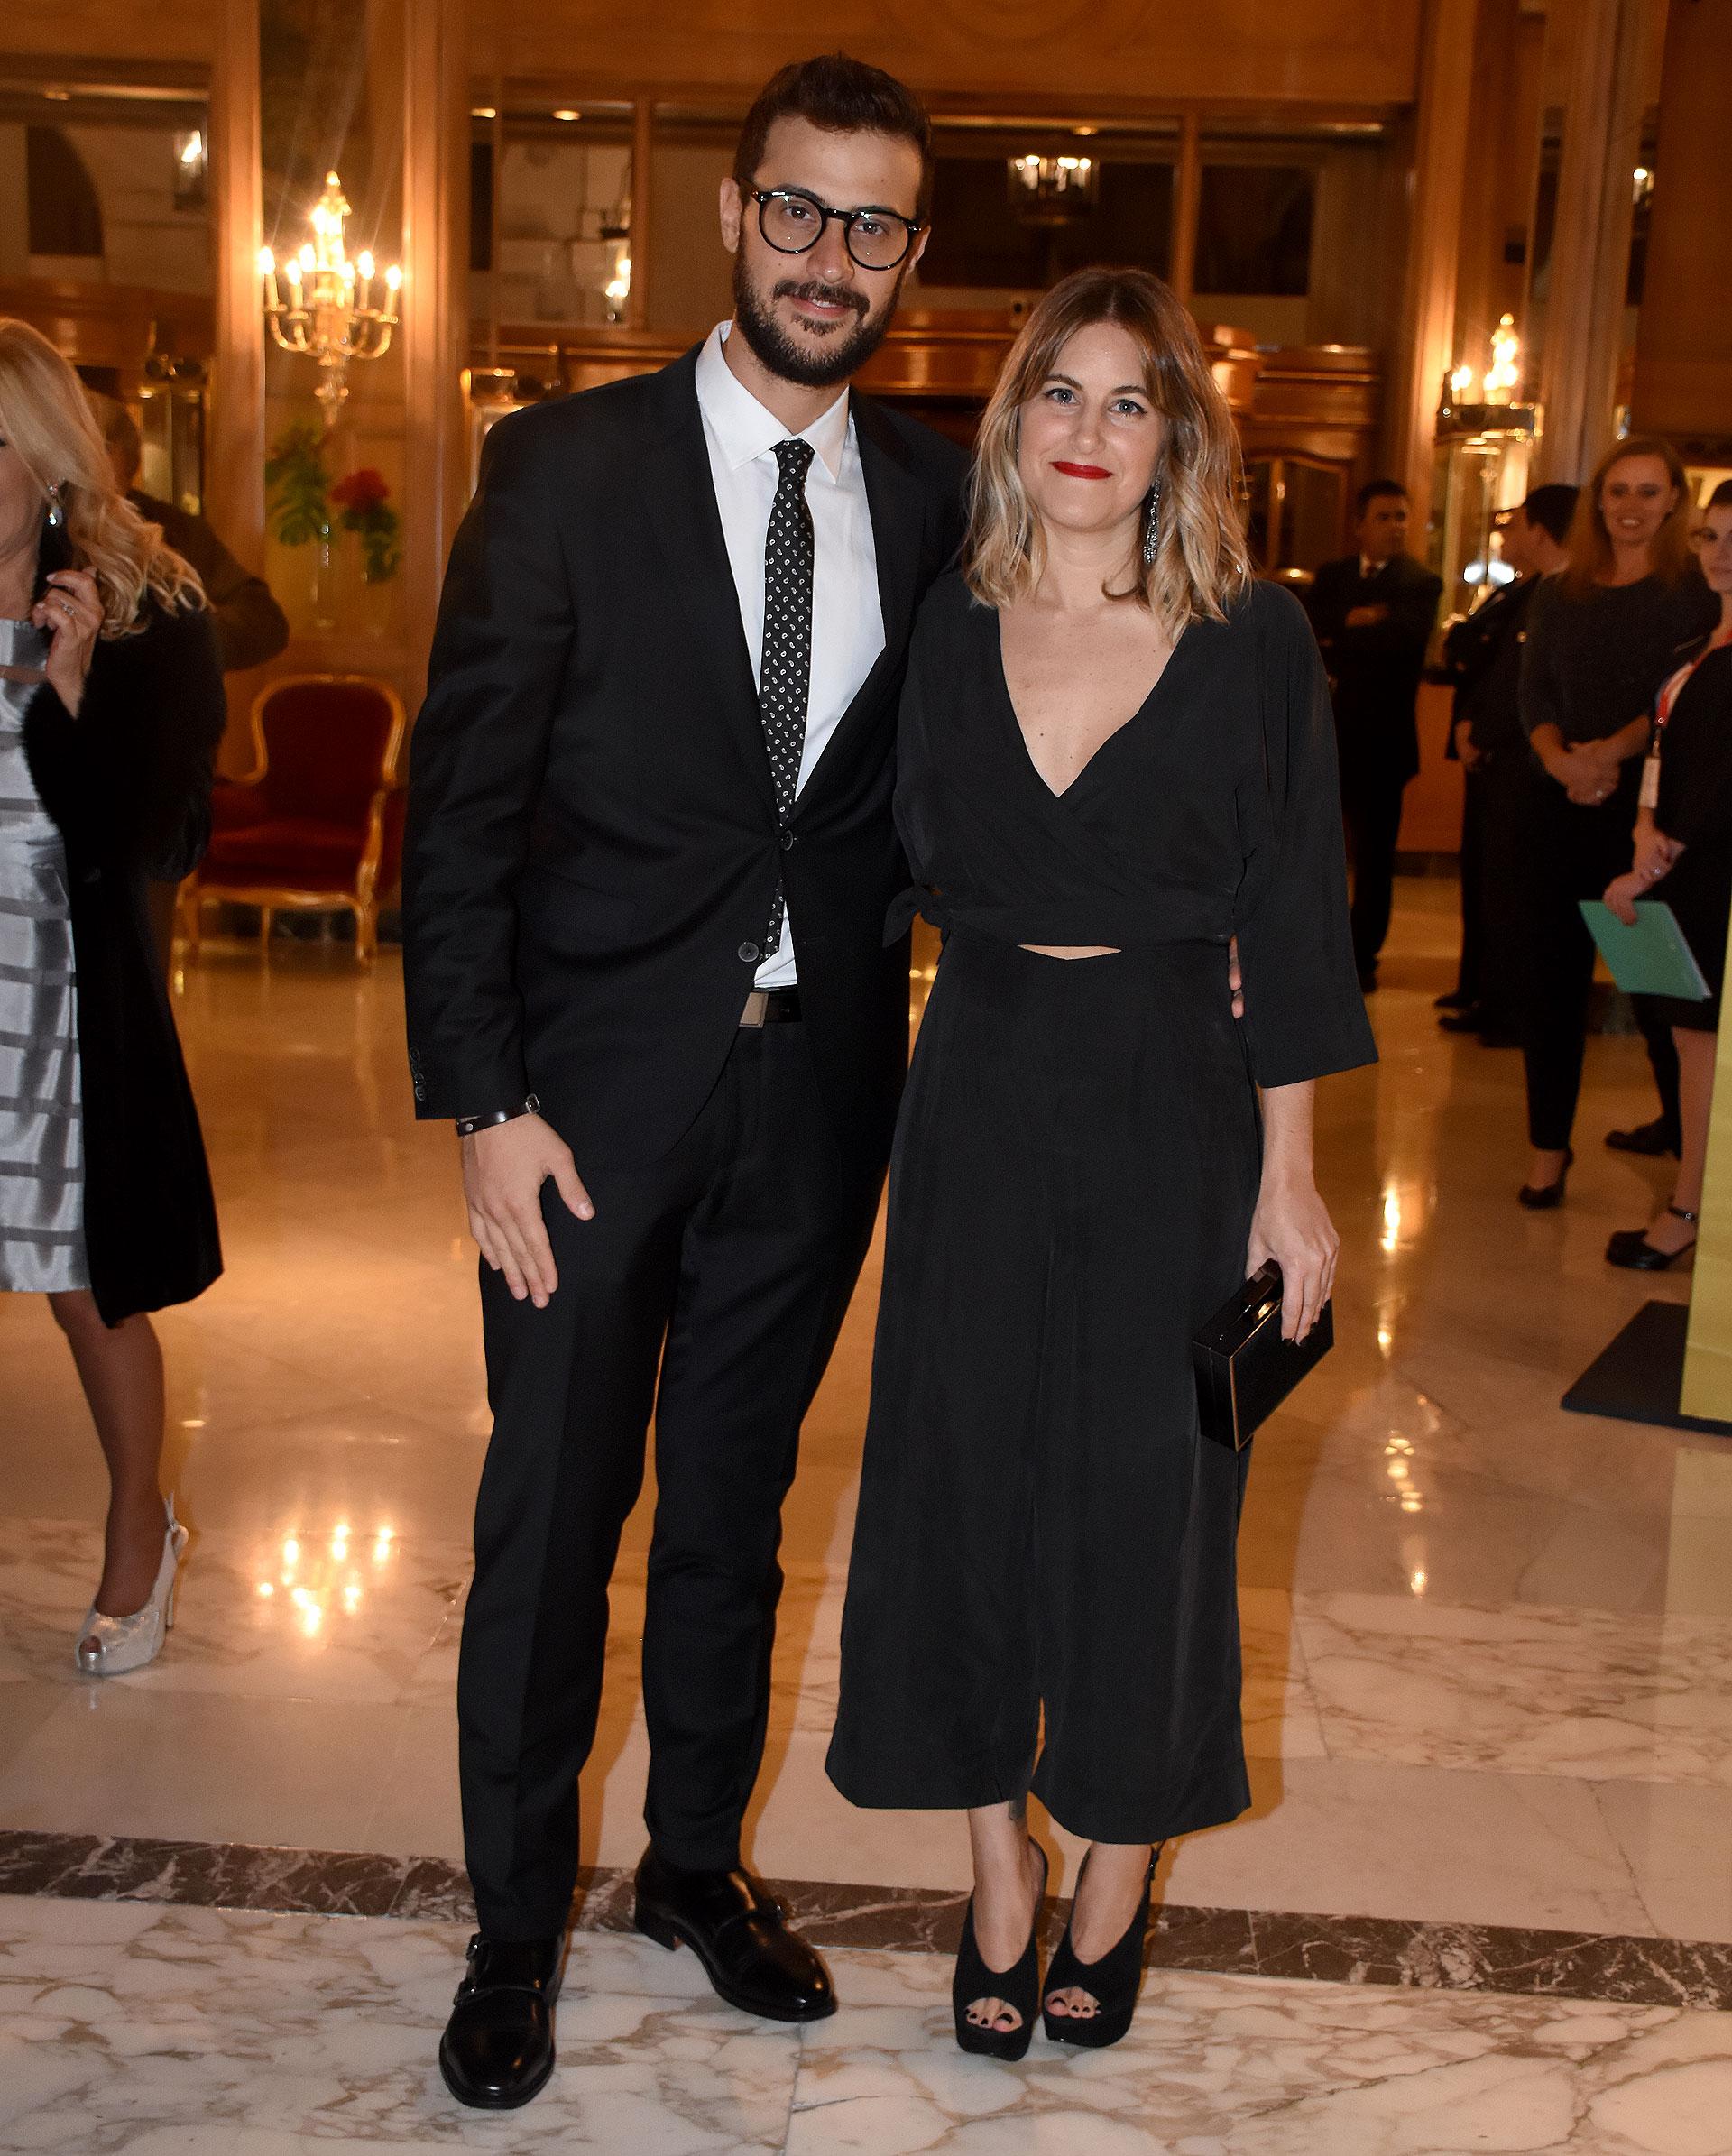 El periodista Diego Leuco junto a su novia Daniela Haissiner